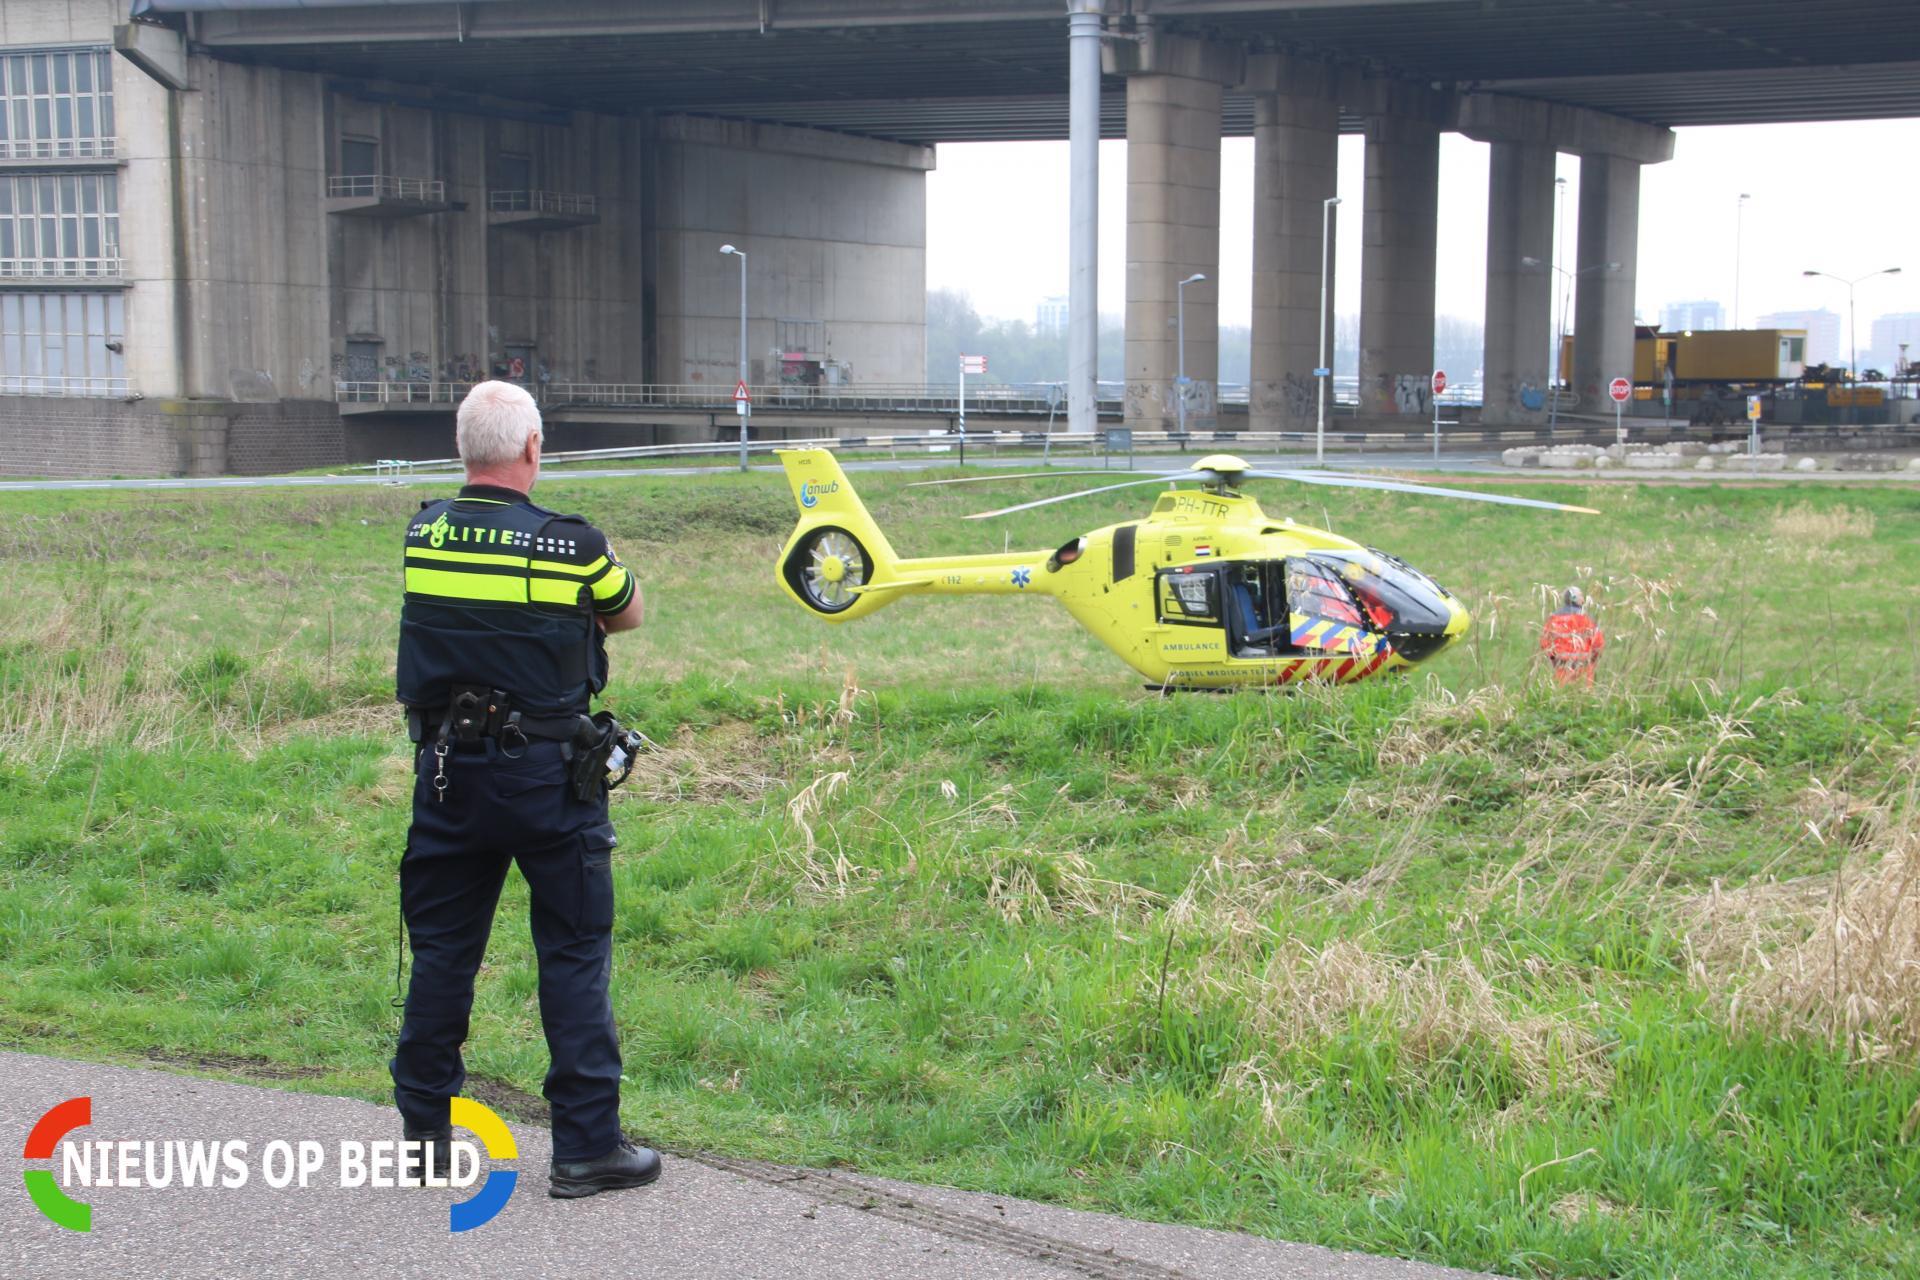 Vrouw gewond na valpartij op fietspad van Brienenoordbrug Rotterdam